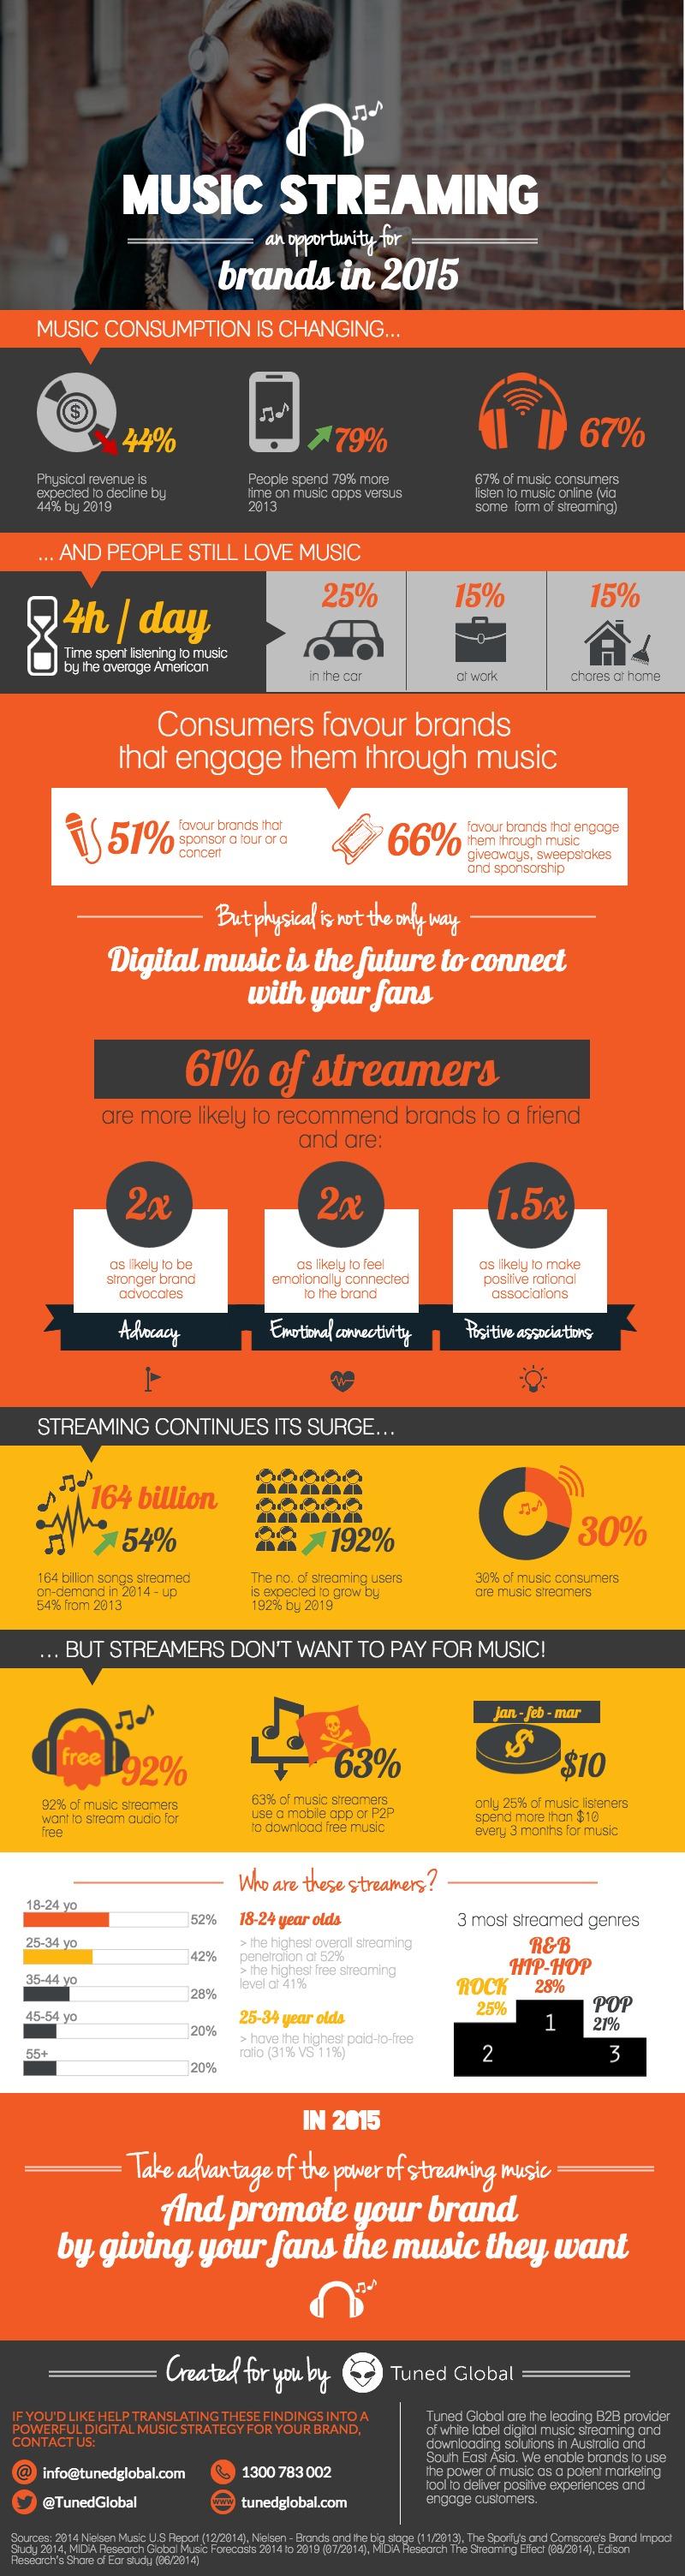 INFO_MusicStreamingForBrands_TunedGlobal_March2015_FINAL